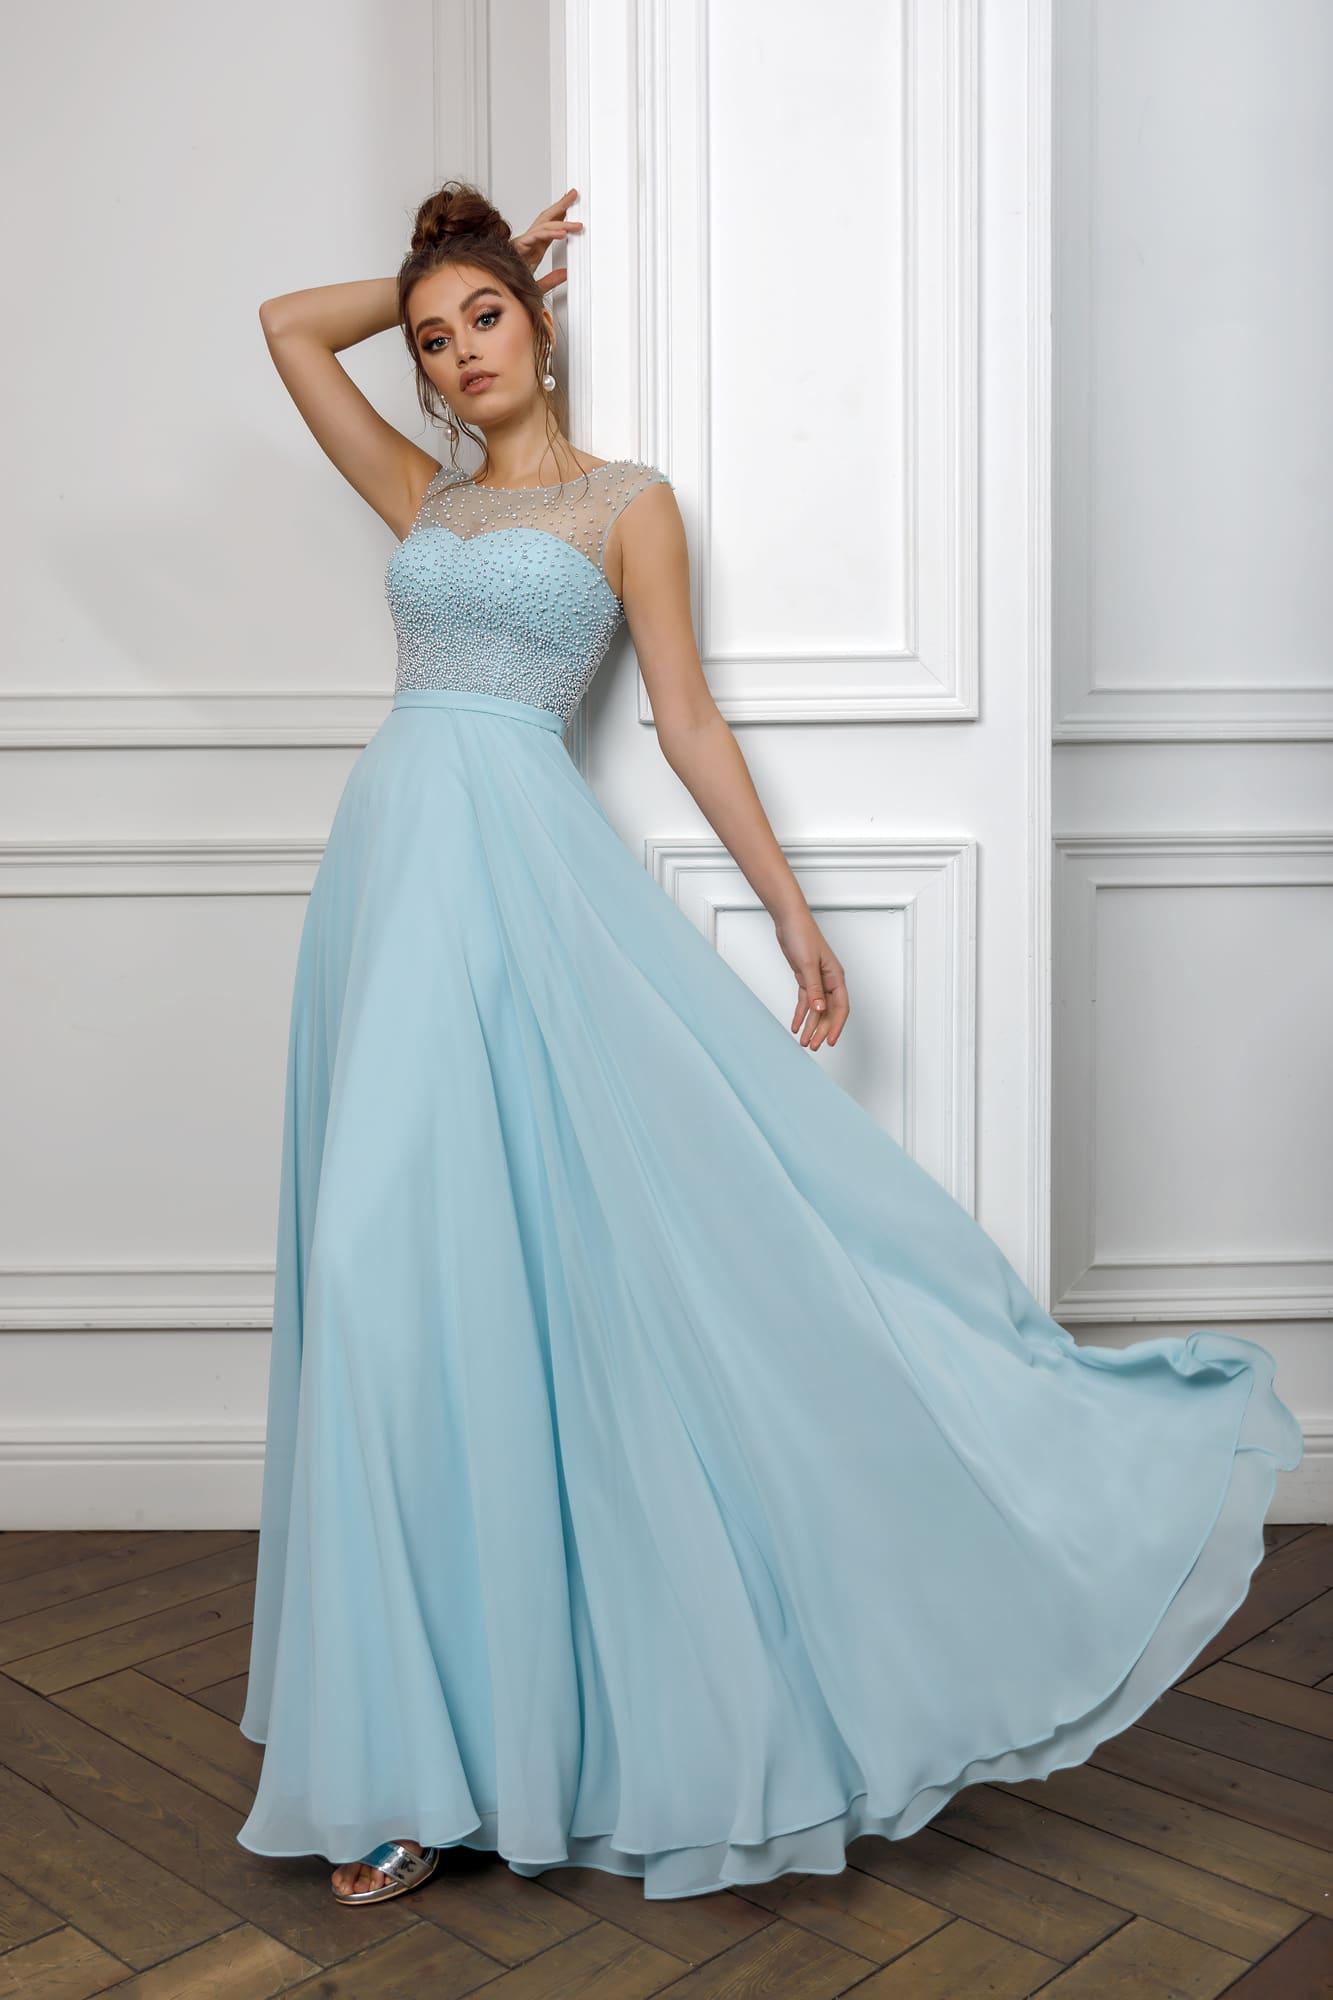 6ae19a64411  product vechernie-platya 32405b-ivory  product vechernie-platya 32405b-sky- blue. Nora Naviano ...